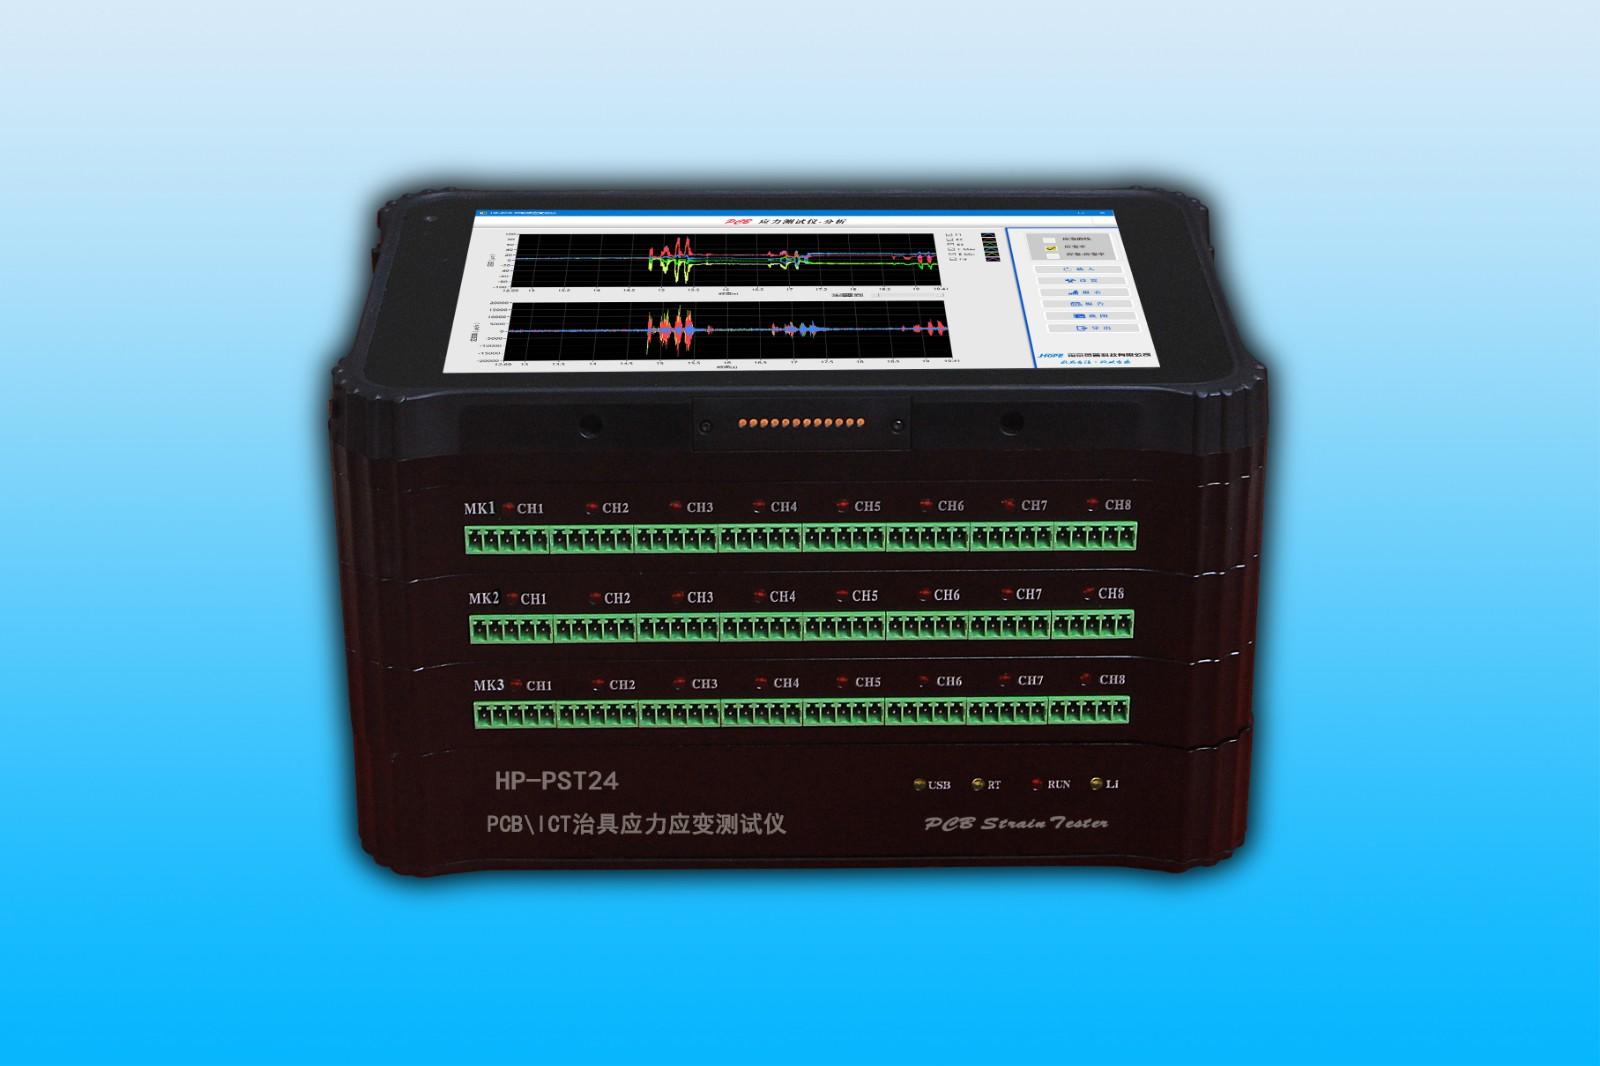 HP-PST24 印制板优发国际顶级在线应变测试仪